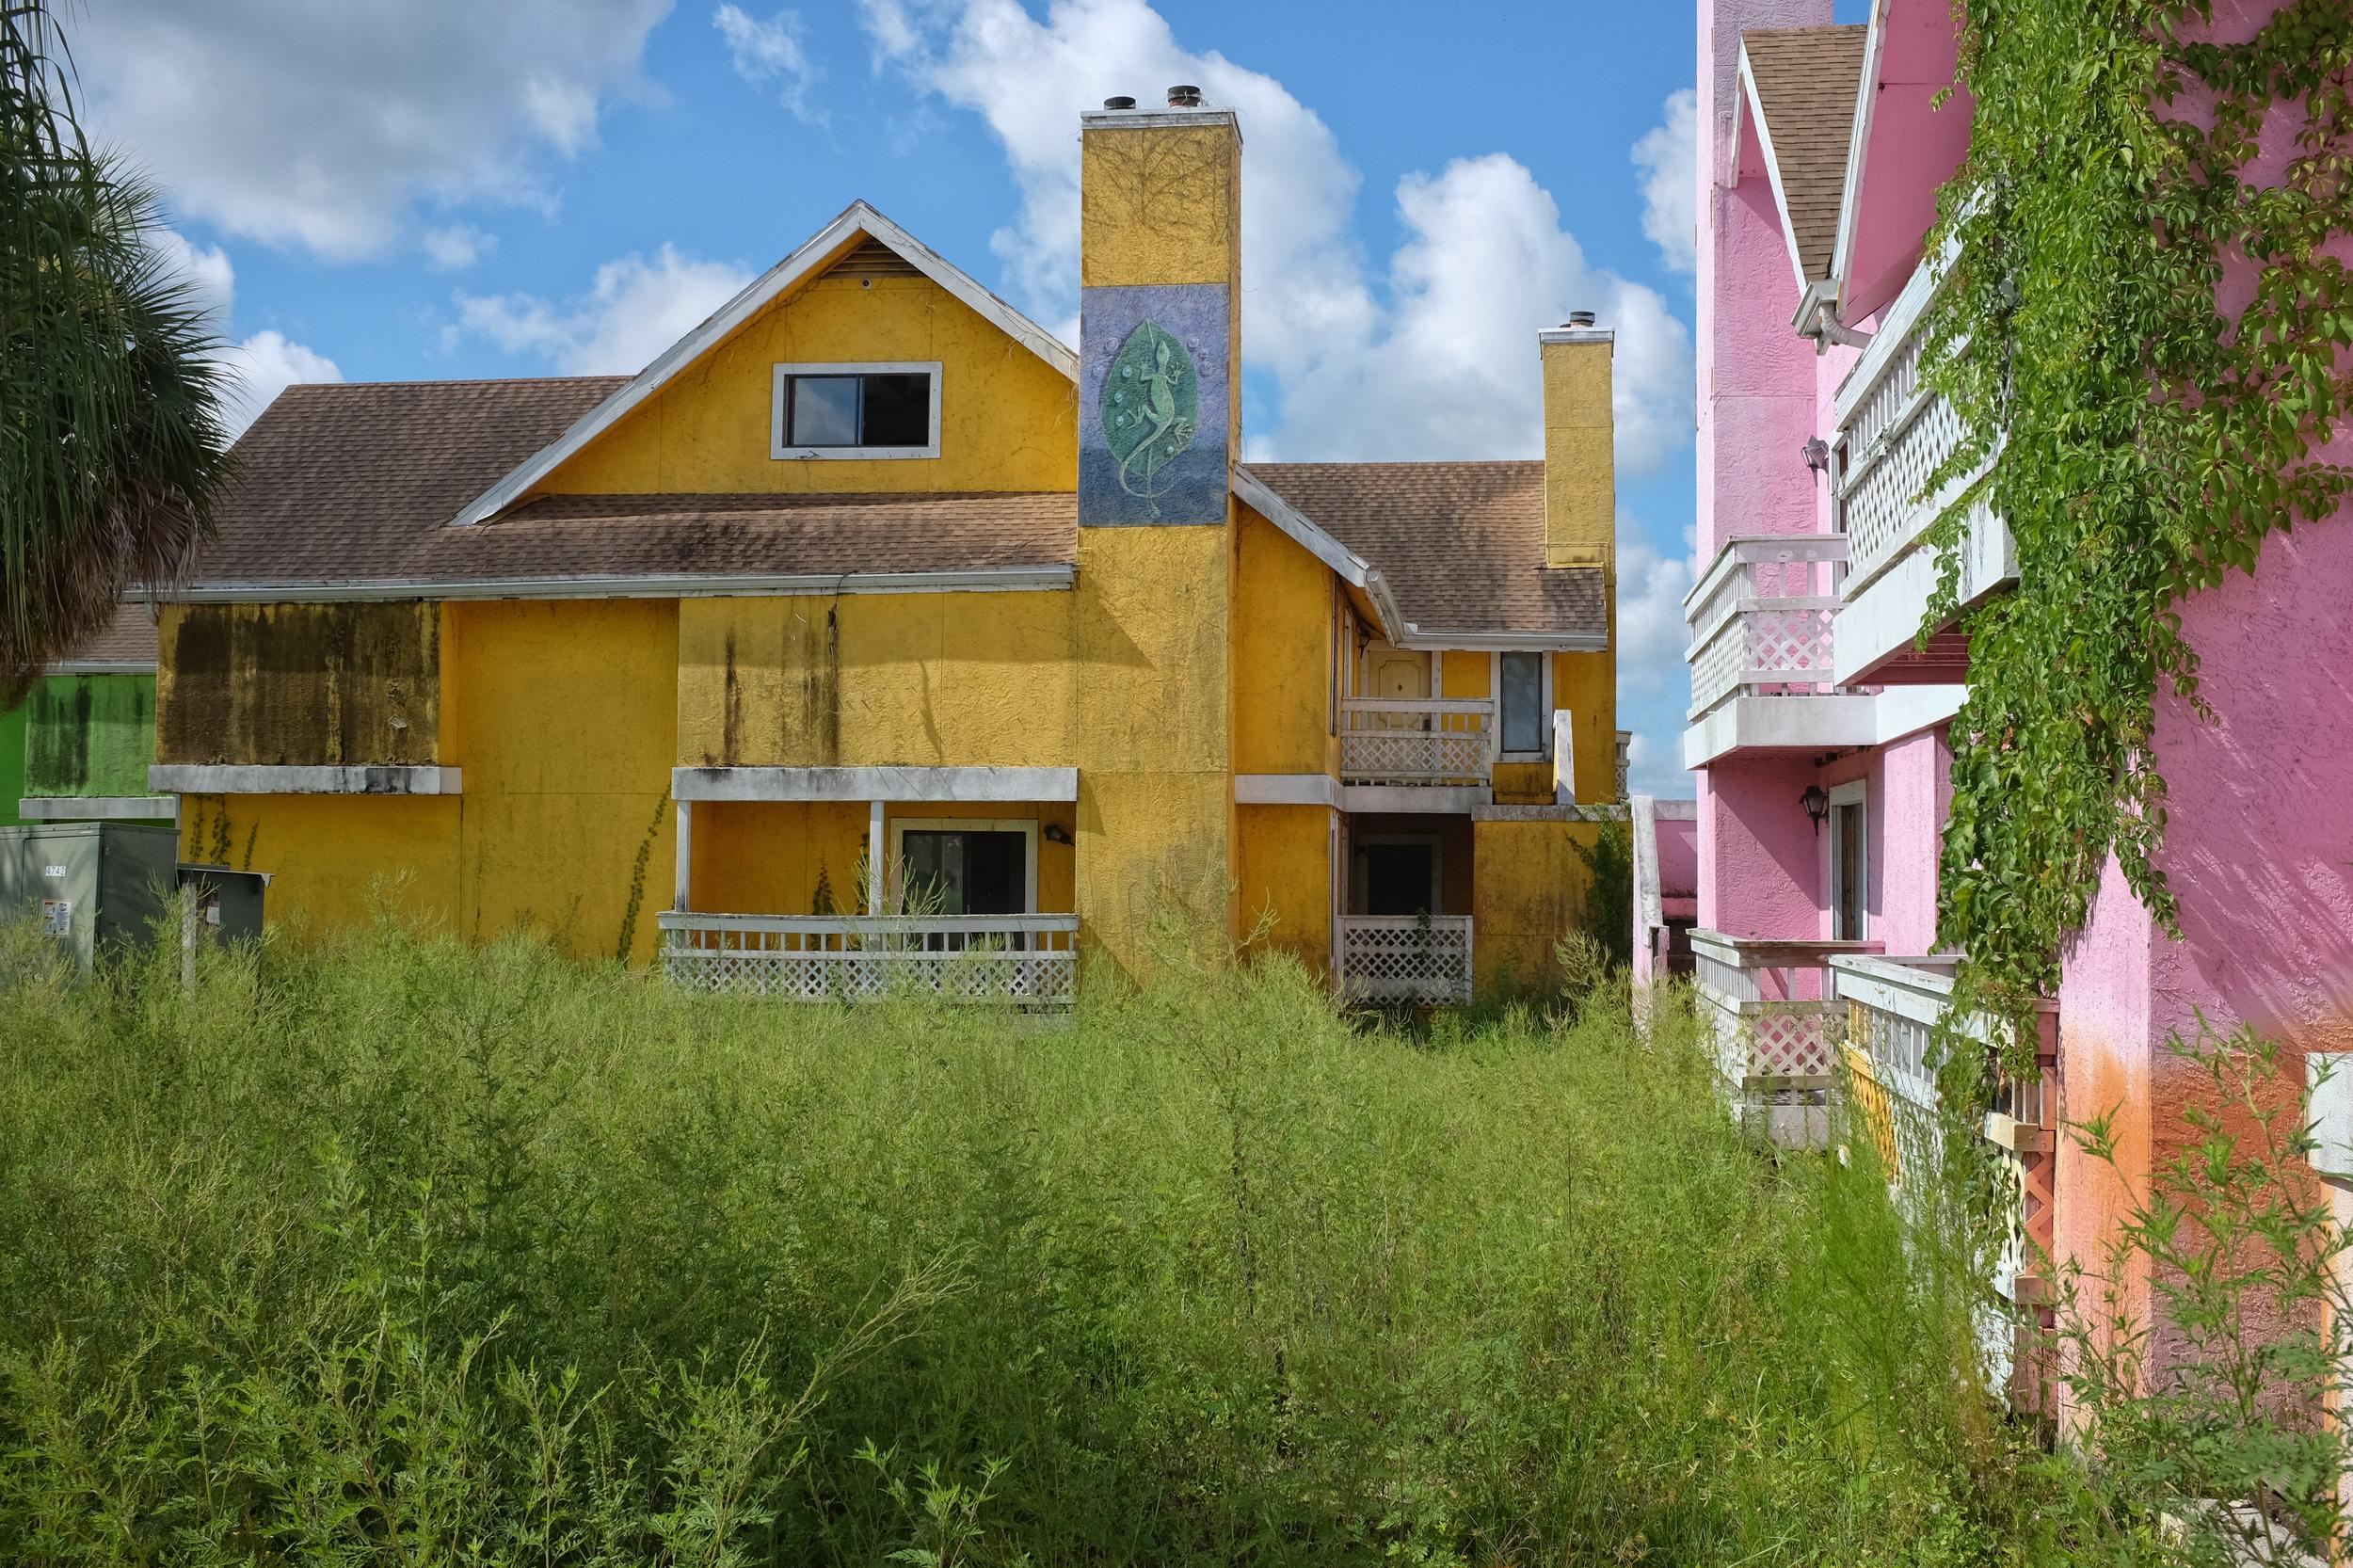 Summer Homes 1 (1 of 1).jpg